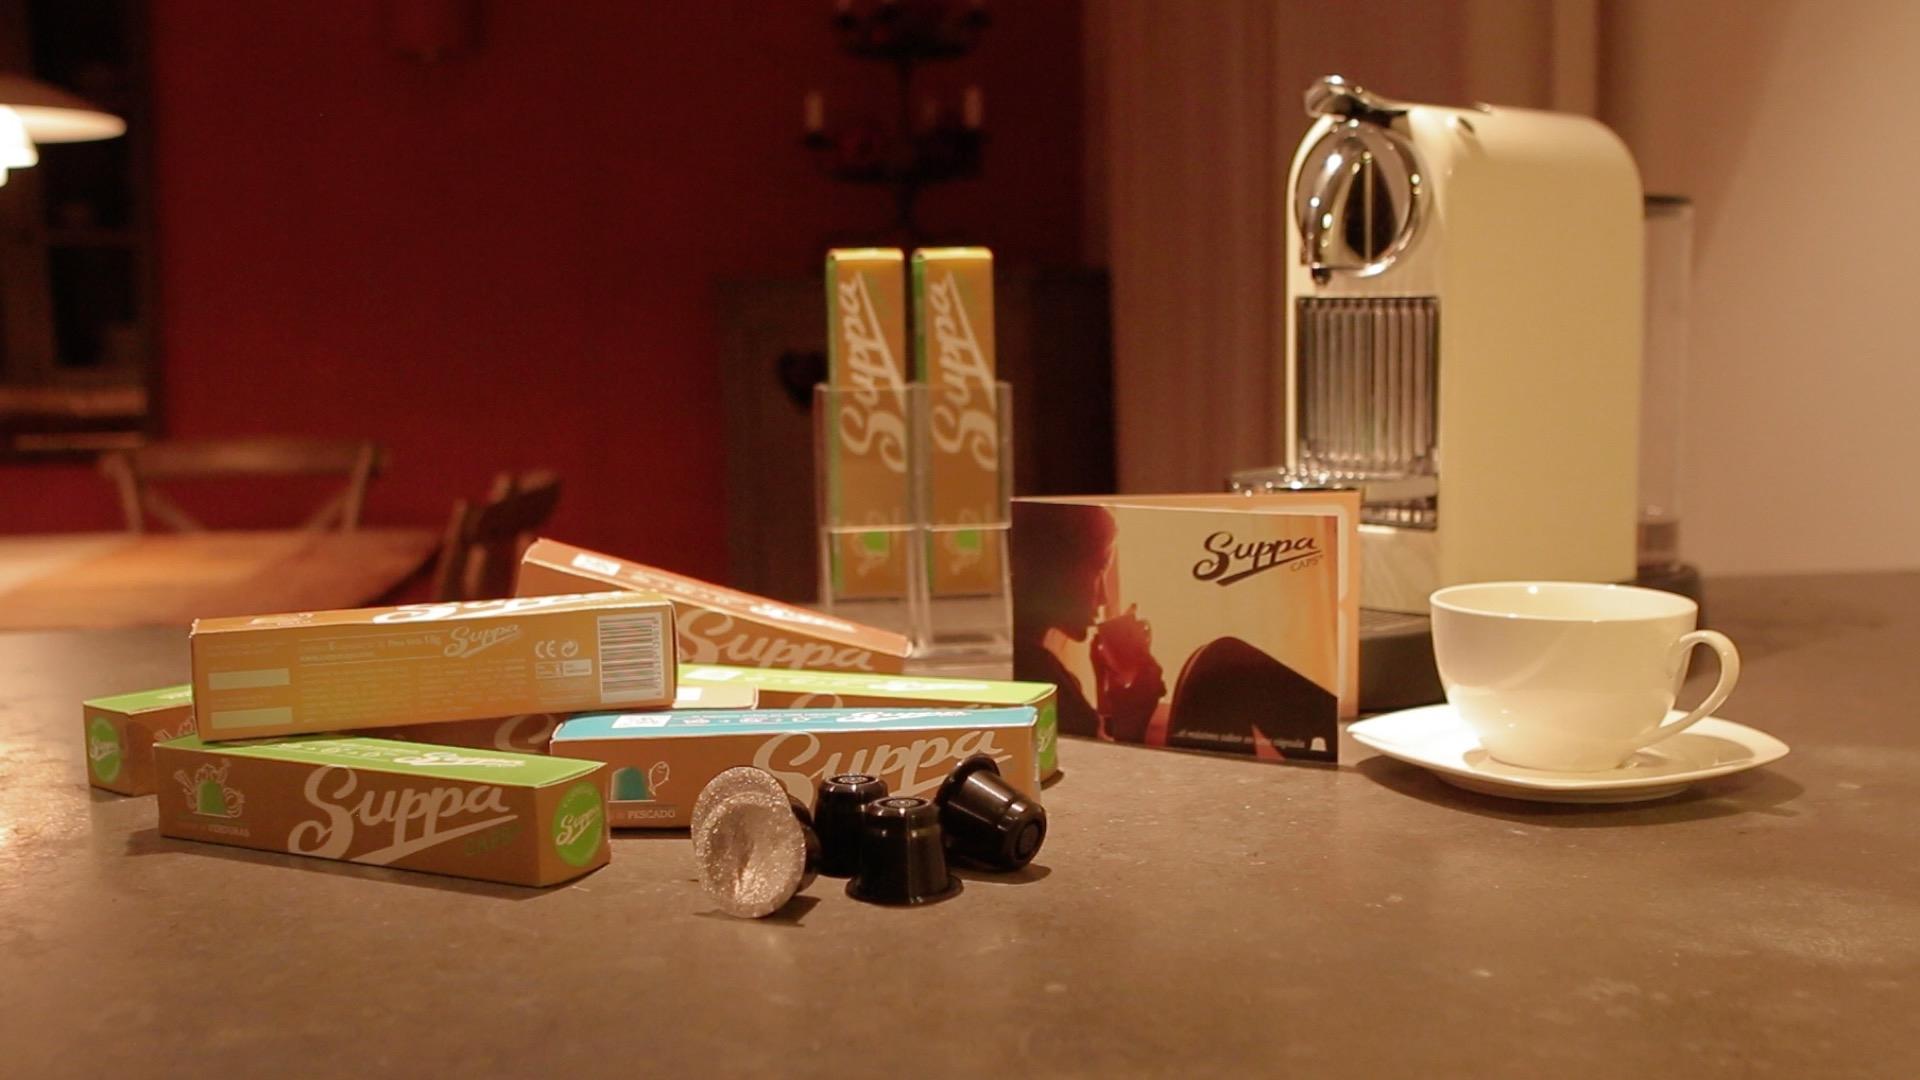 suppacaps-capsulas-de-caldo-compatabiles-con-cafeteras-nespresso-diario-de-emprendedores